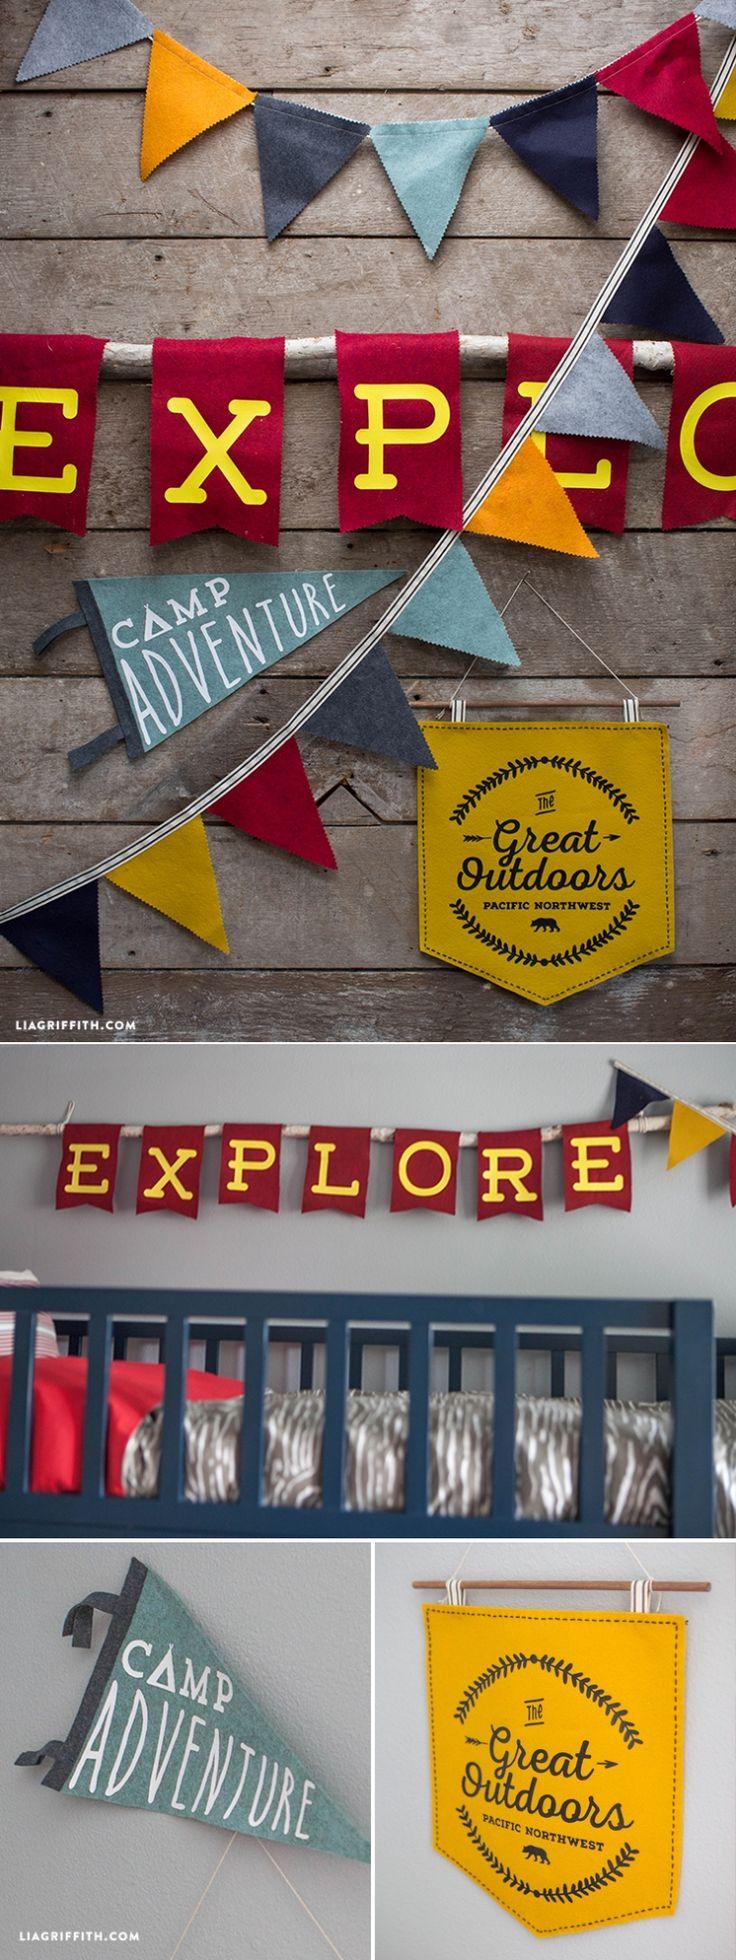 #DIYsigns #Wallart #kidsroomdecor www.LiaGriffith.com